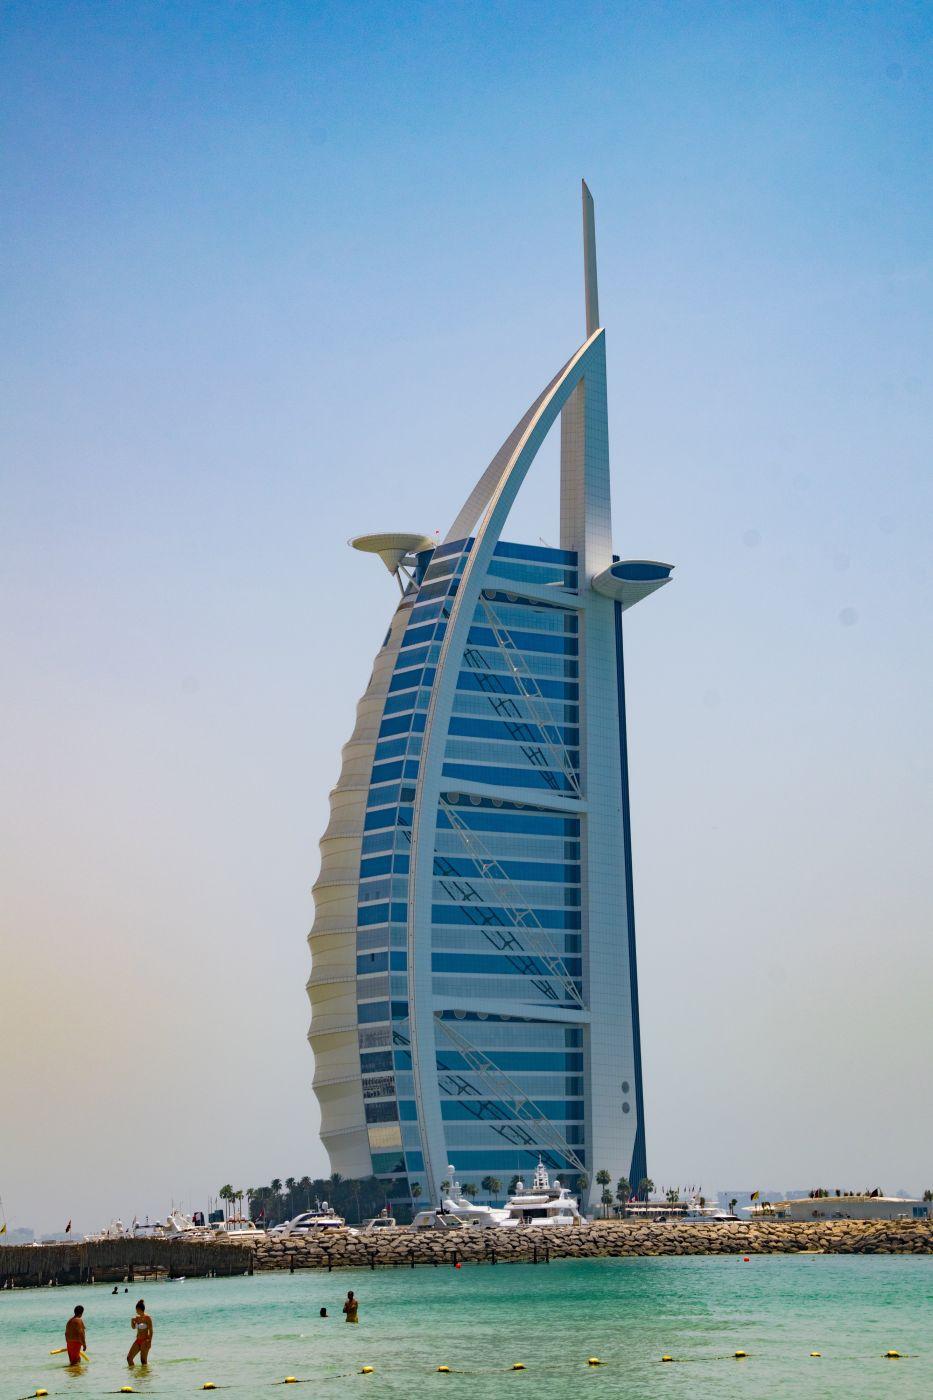 Burj al arab & Atlantis the palm in the dust, United Arab Emirates